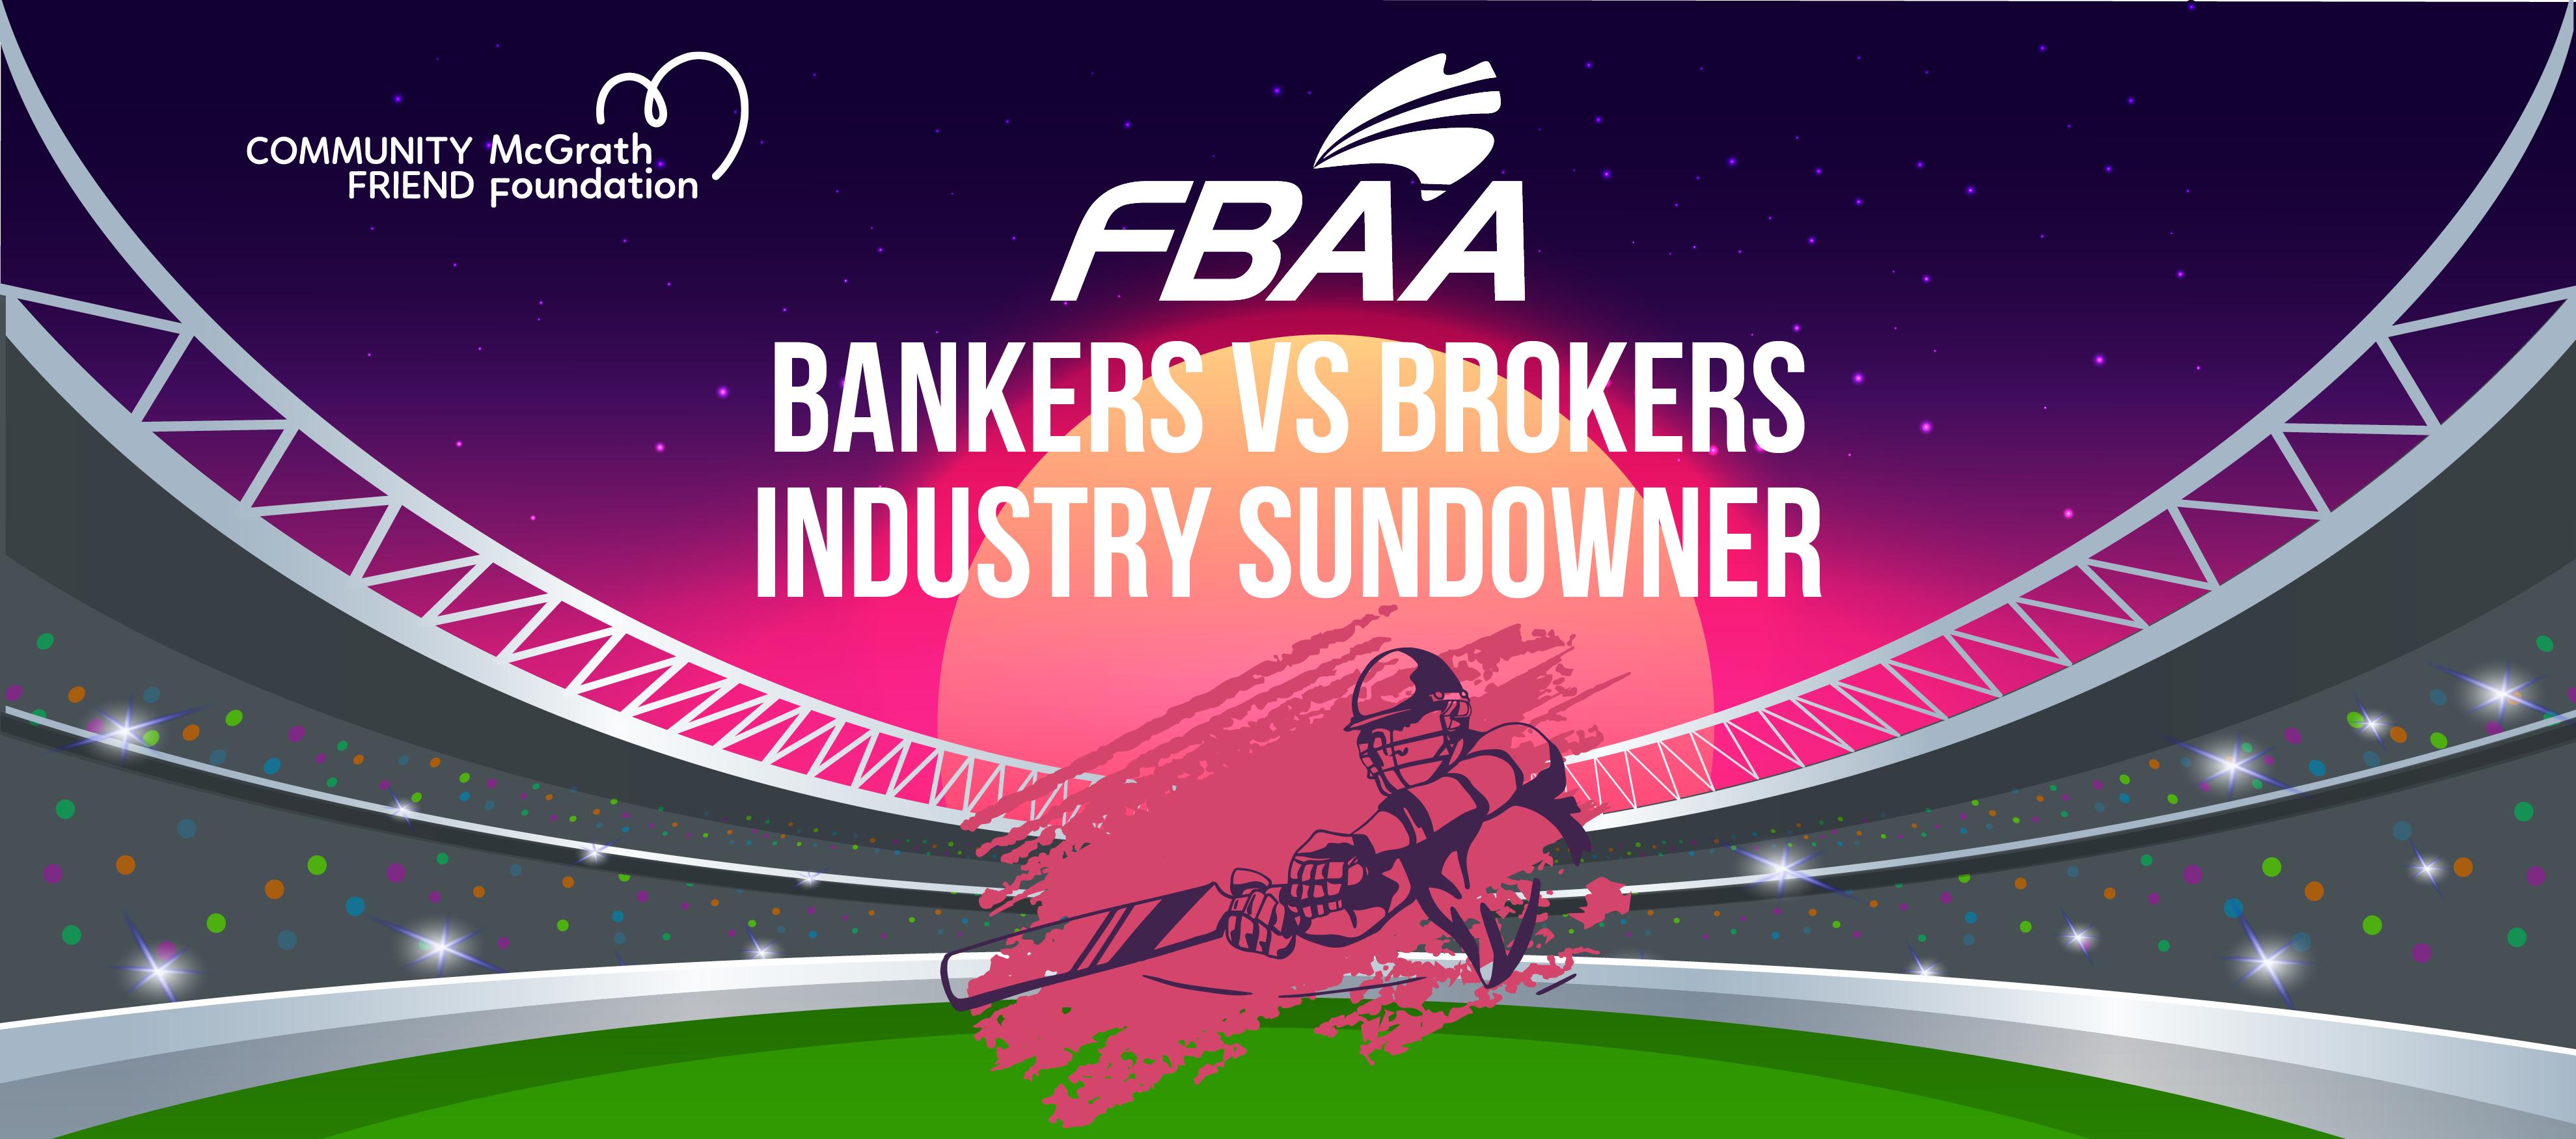 WA Bankers vs Brokers - FBAA Industry Sundowner